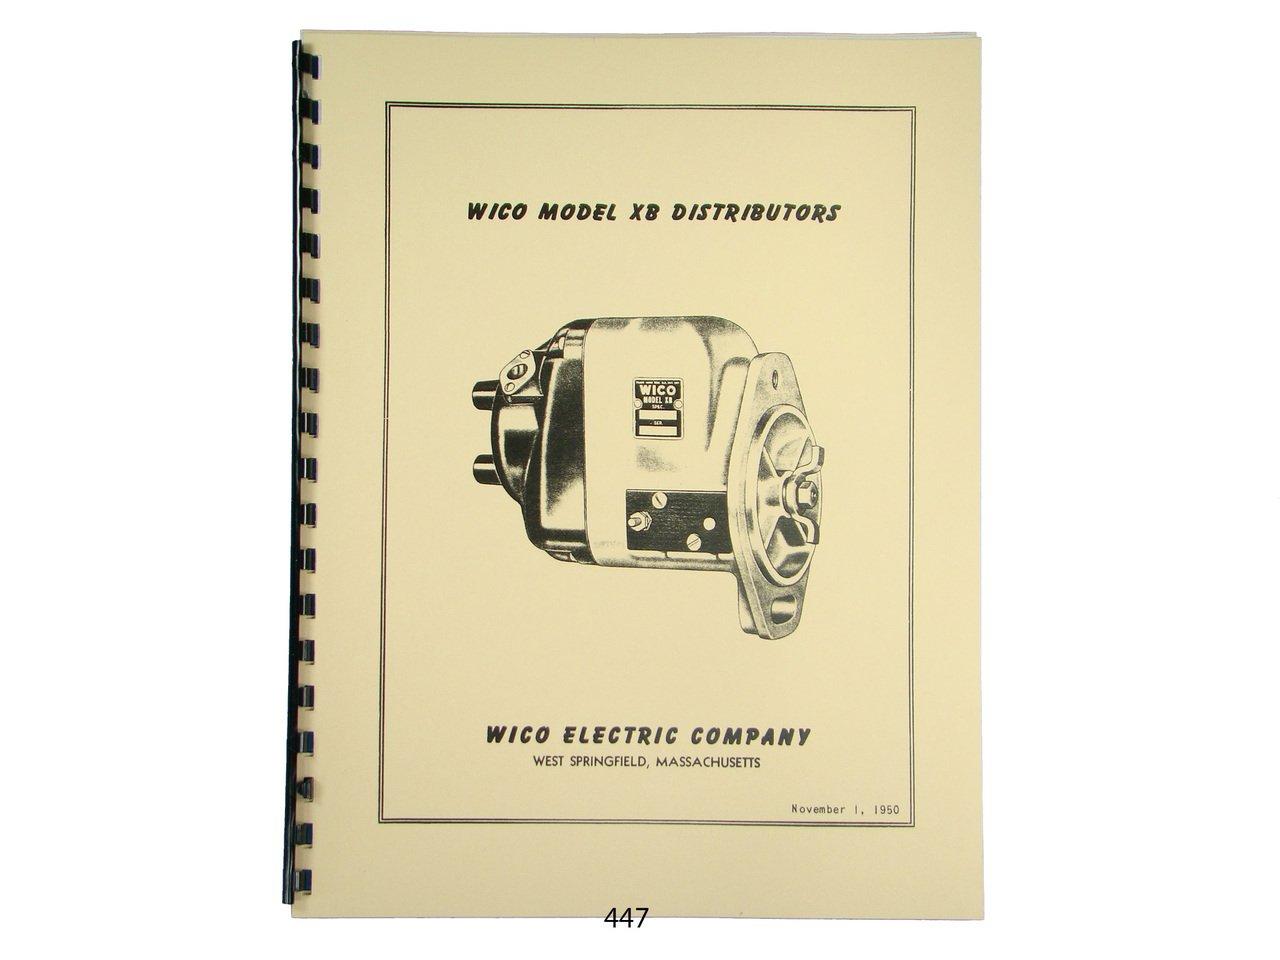 wico service parts manual for xb distributor magneto john deere rh amazon com E198635 Wiring Schematic 1992 Yamaha G9 Wiring Schematic